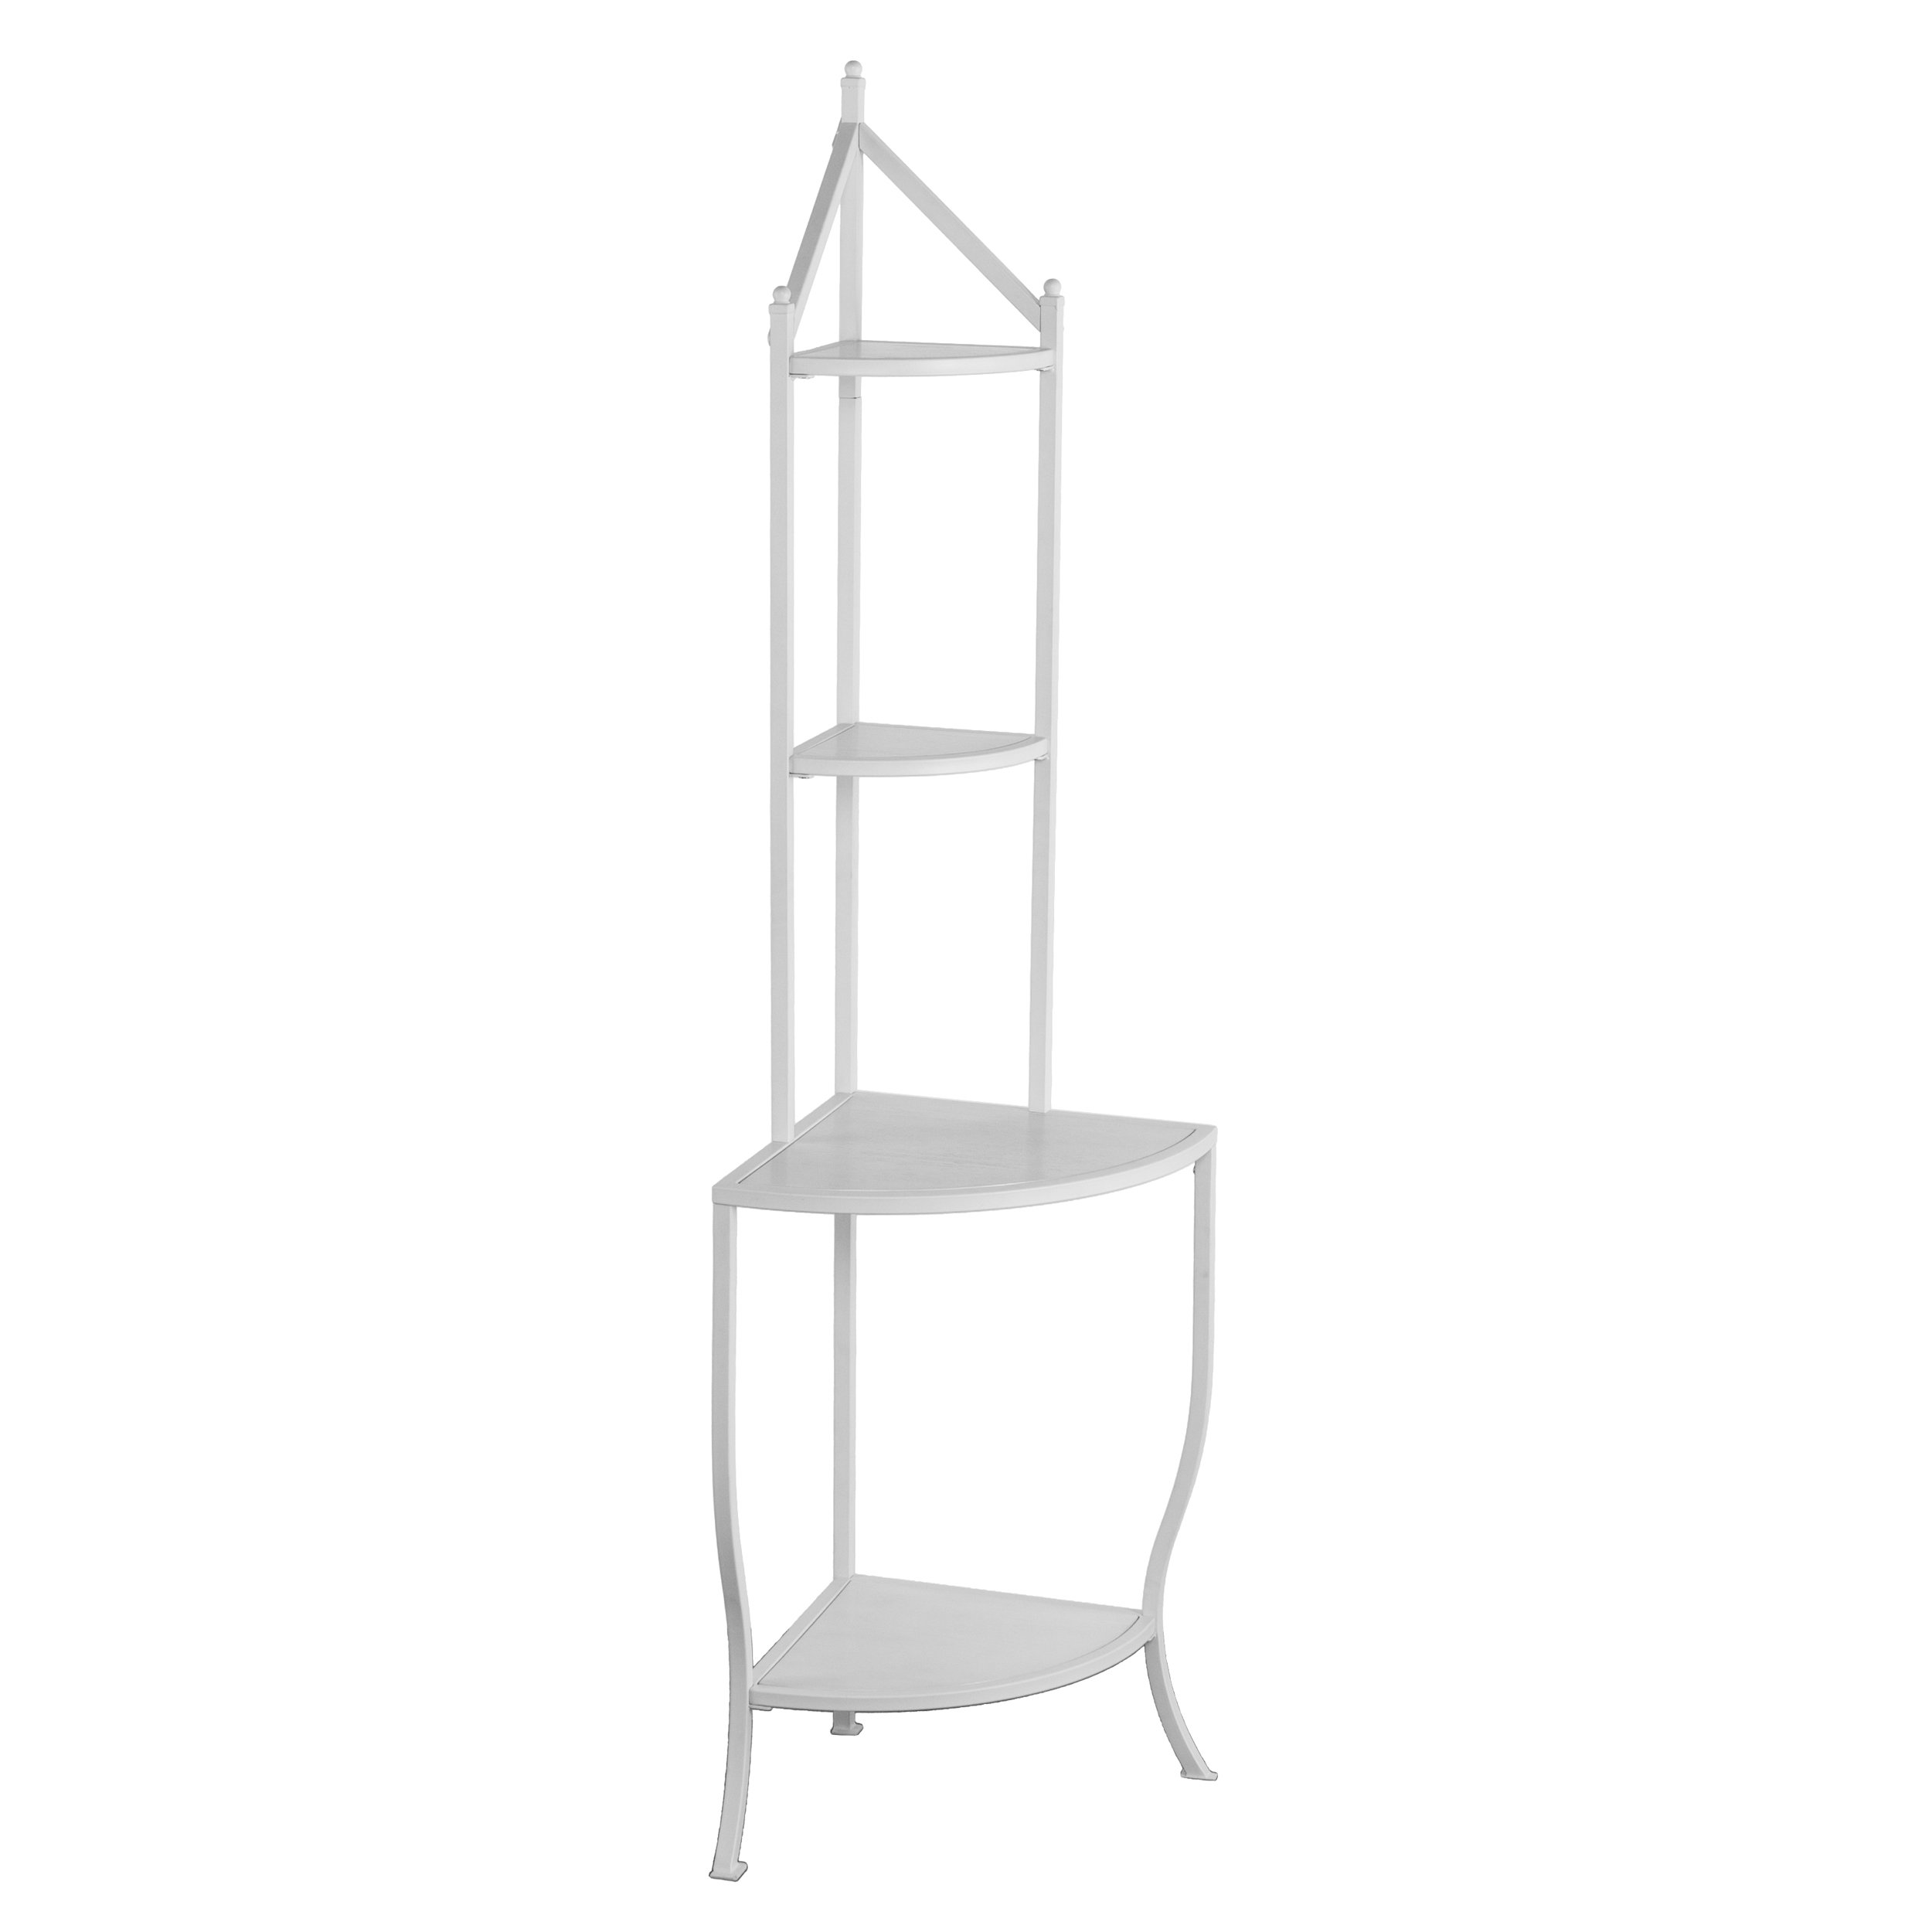 Furniture HotSpot Corner Bakers Rack - White - 25.5'' W x 18'' D x 76'' H by Furniture HotSpot (Image #1)